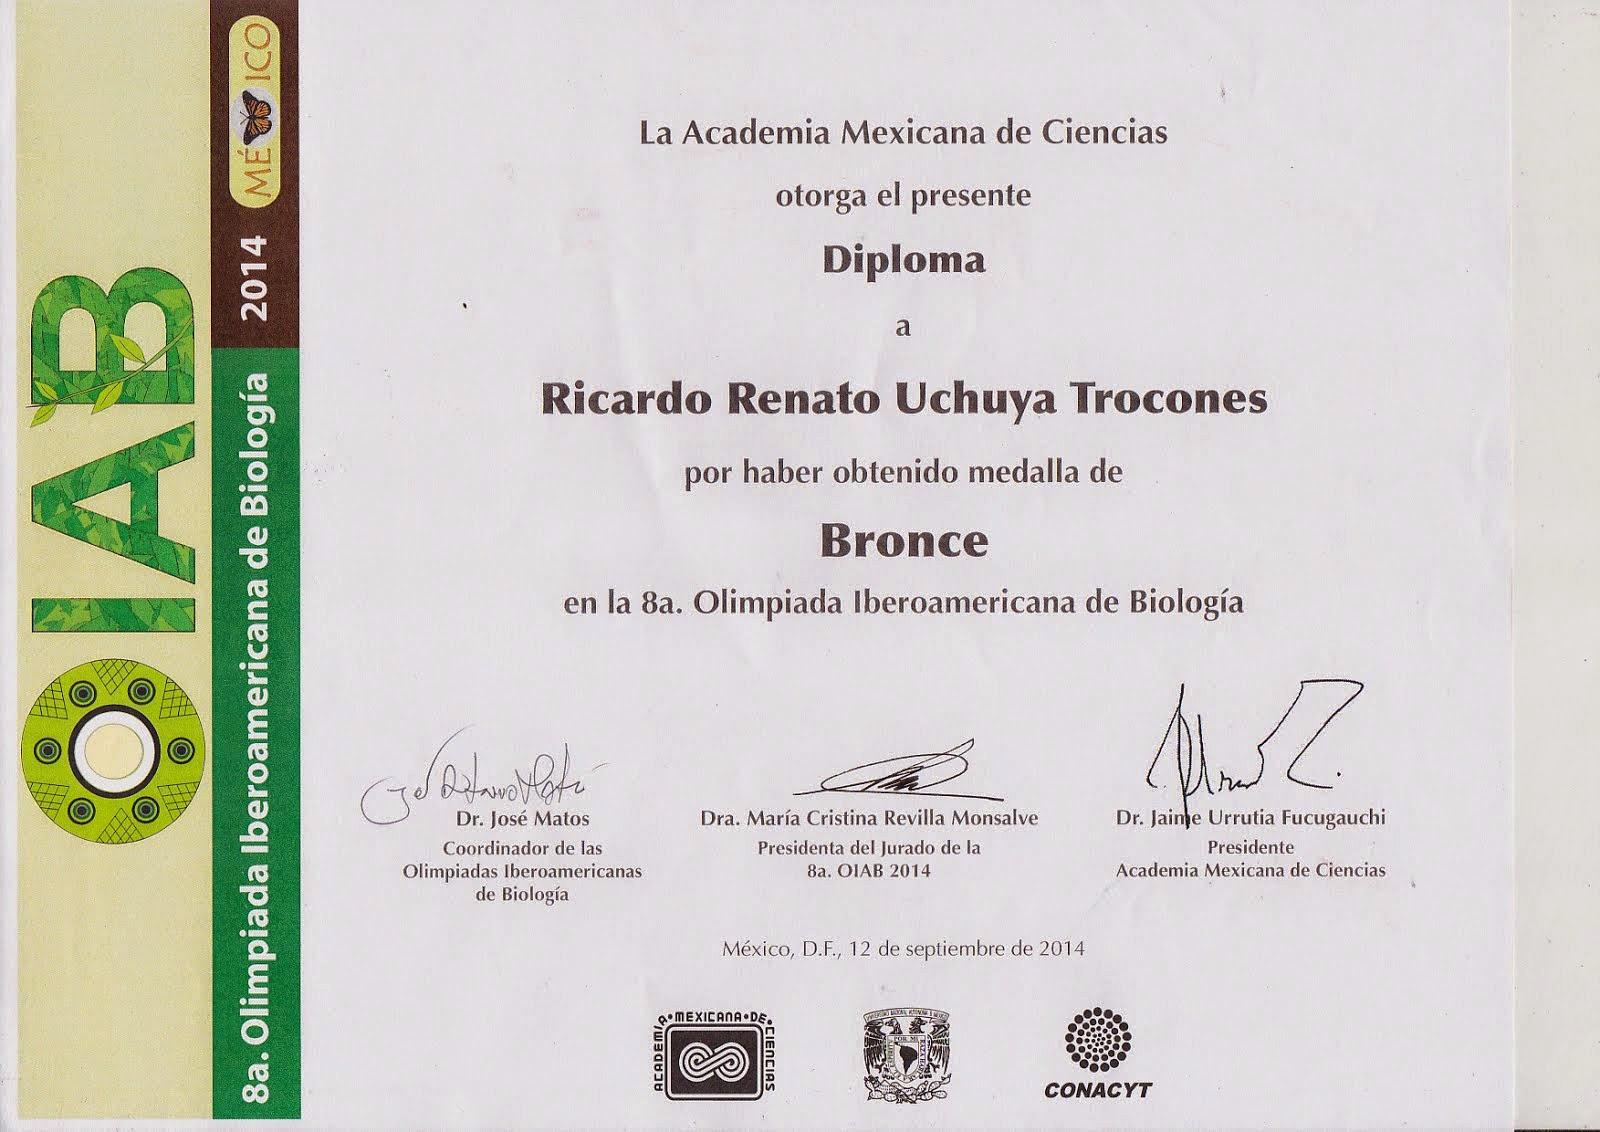 MEDALLA DE BRONCE VIII OLIMPIADA IBEROAMERICANA DE BIOLOGÍA OIAB MÉXICO 2014.